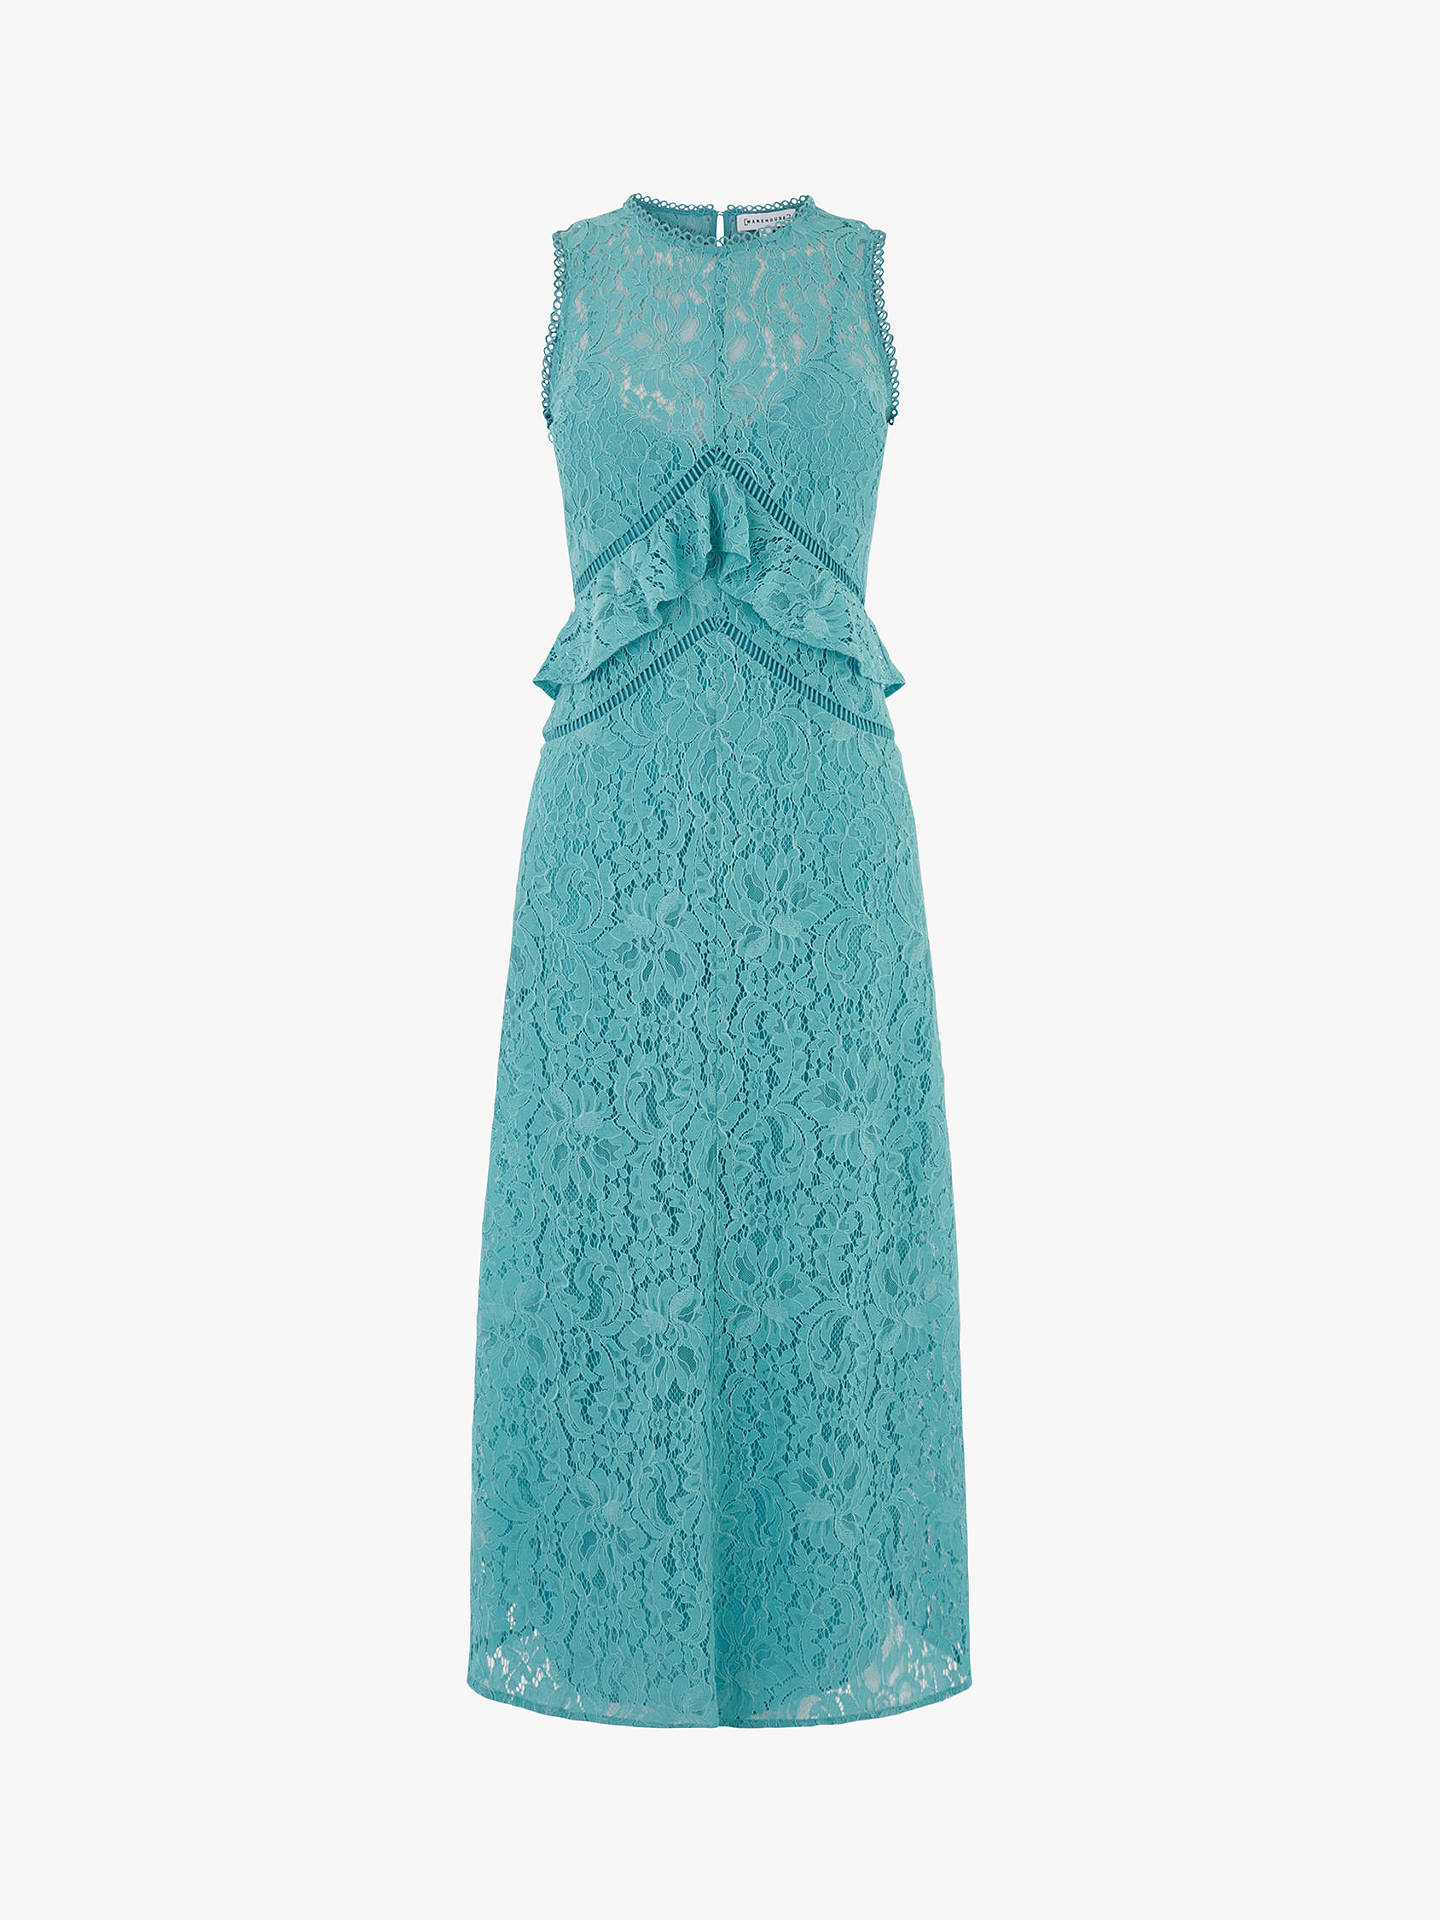 9c918aa1f405 ... Buy Warehouse Frill Lace Dress